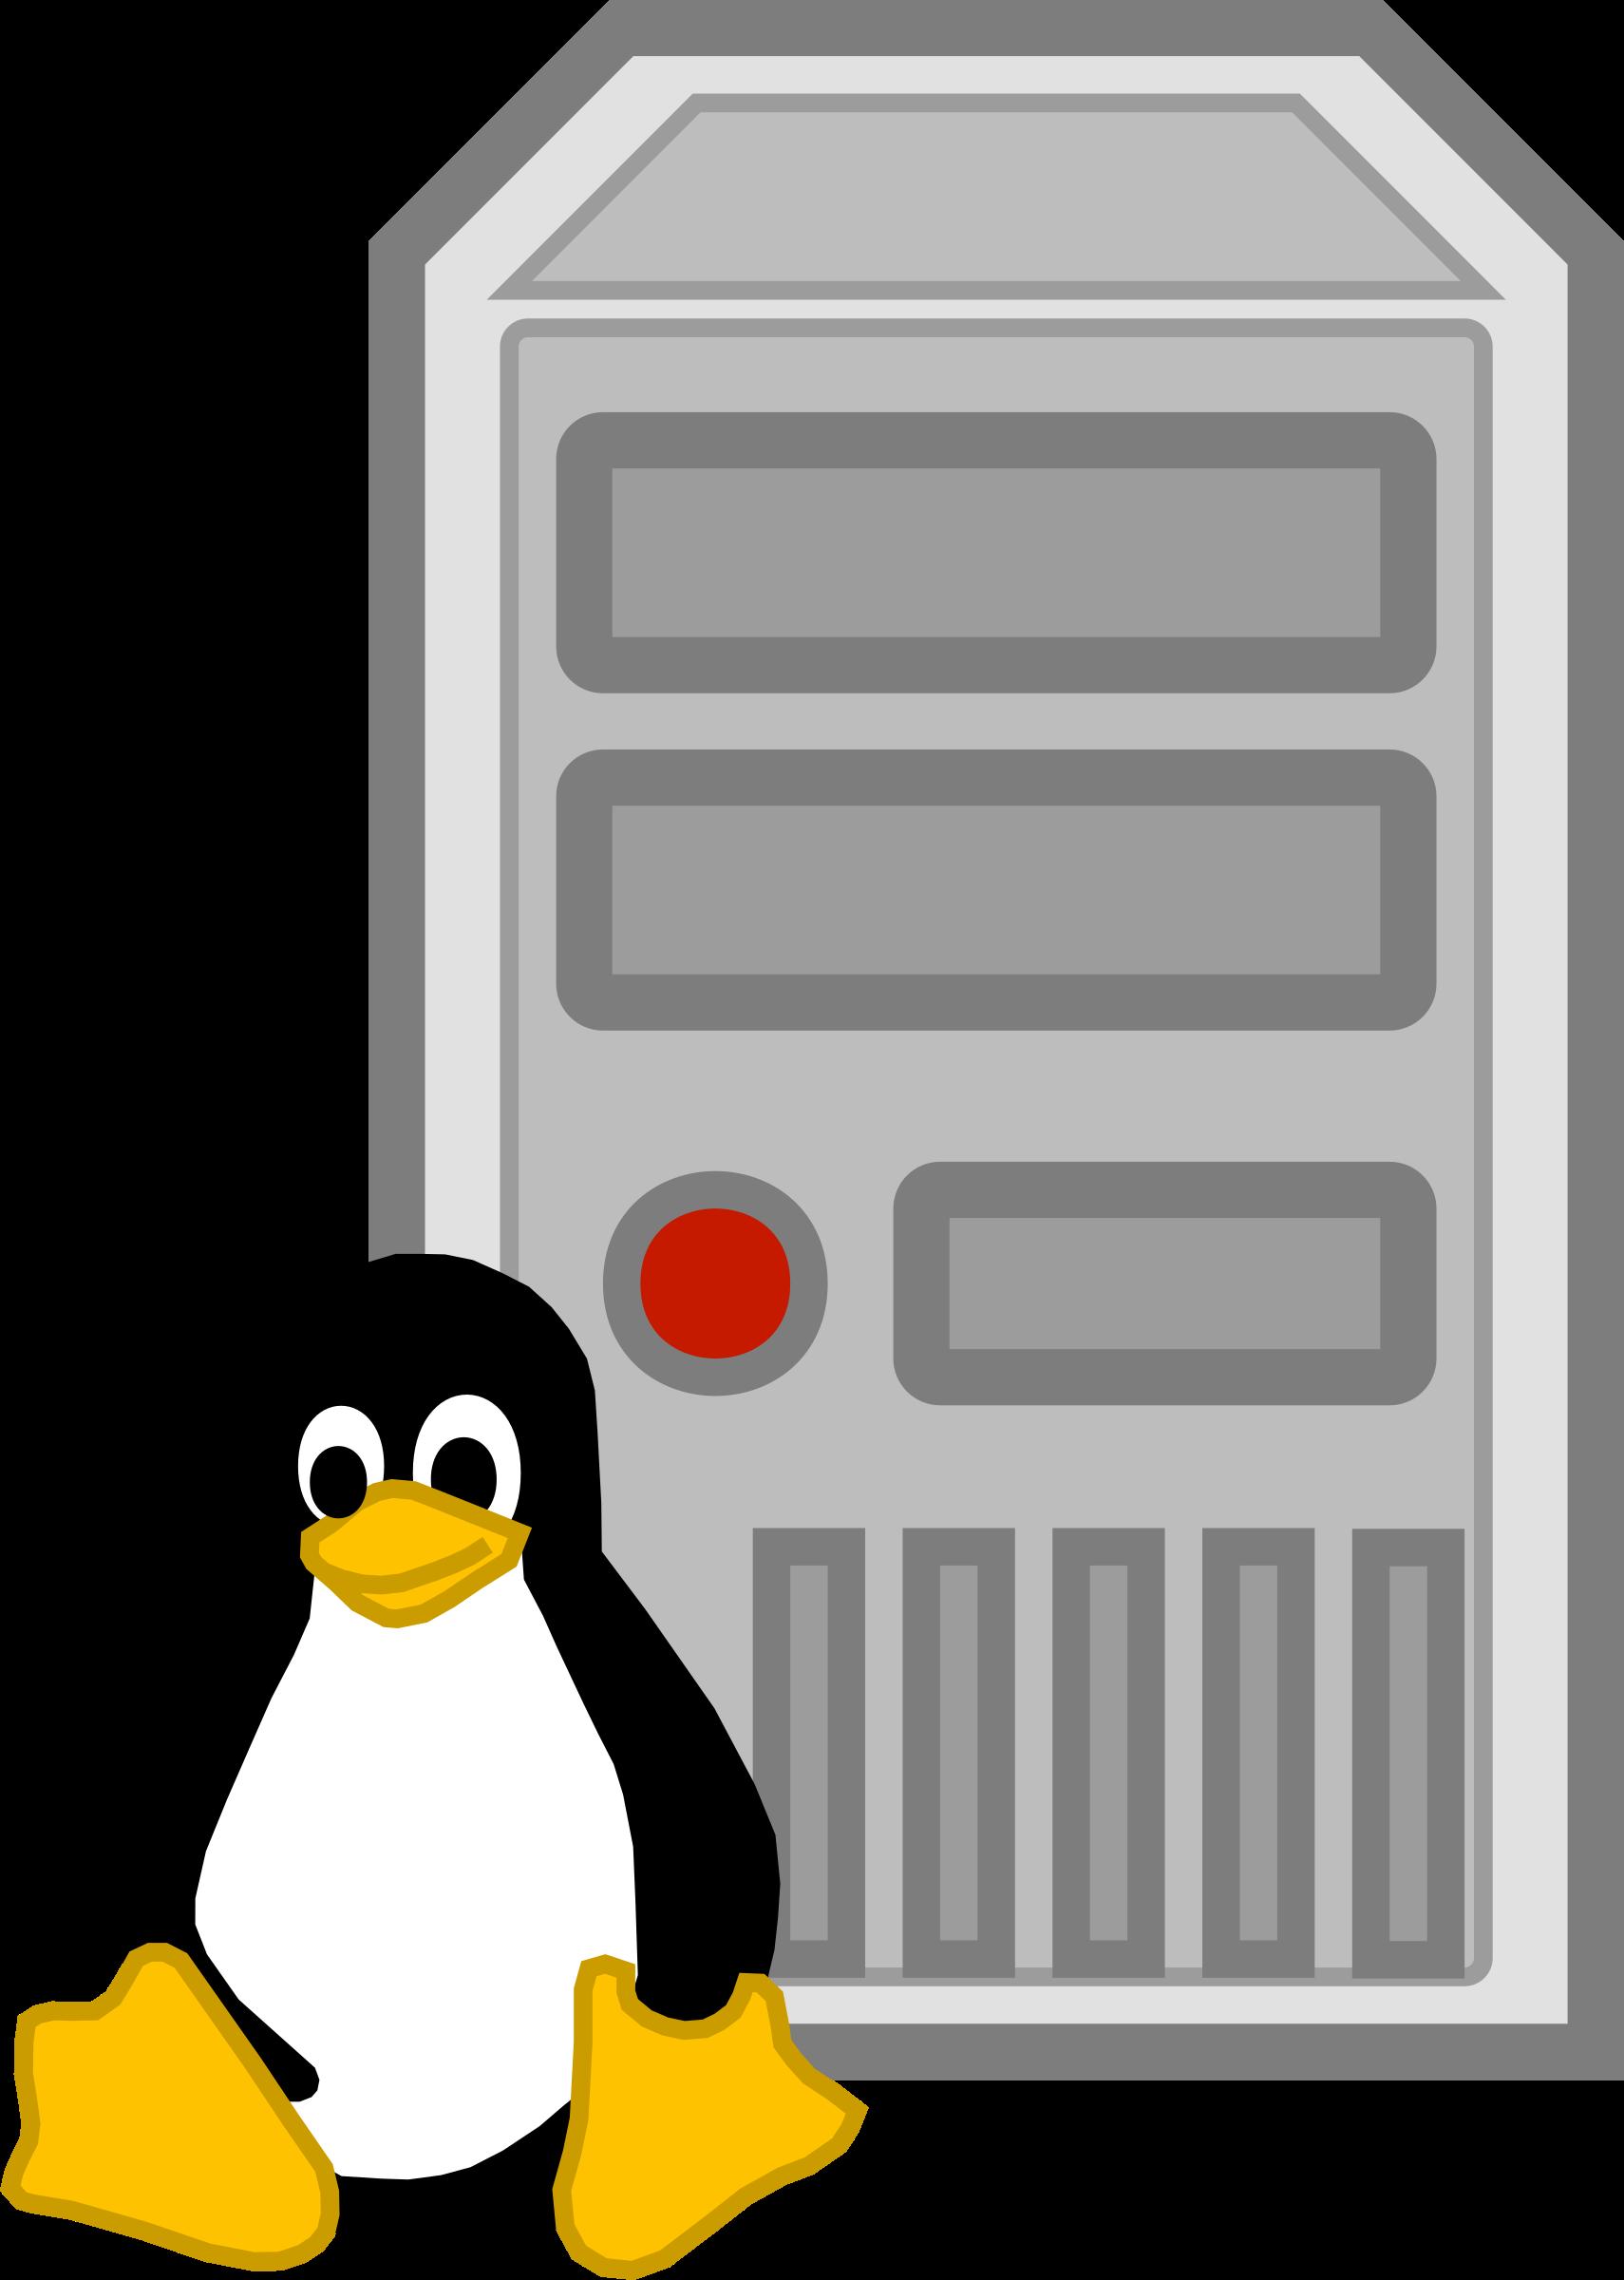 Linux Computer Clipart.